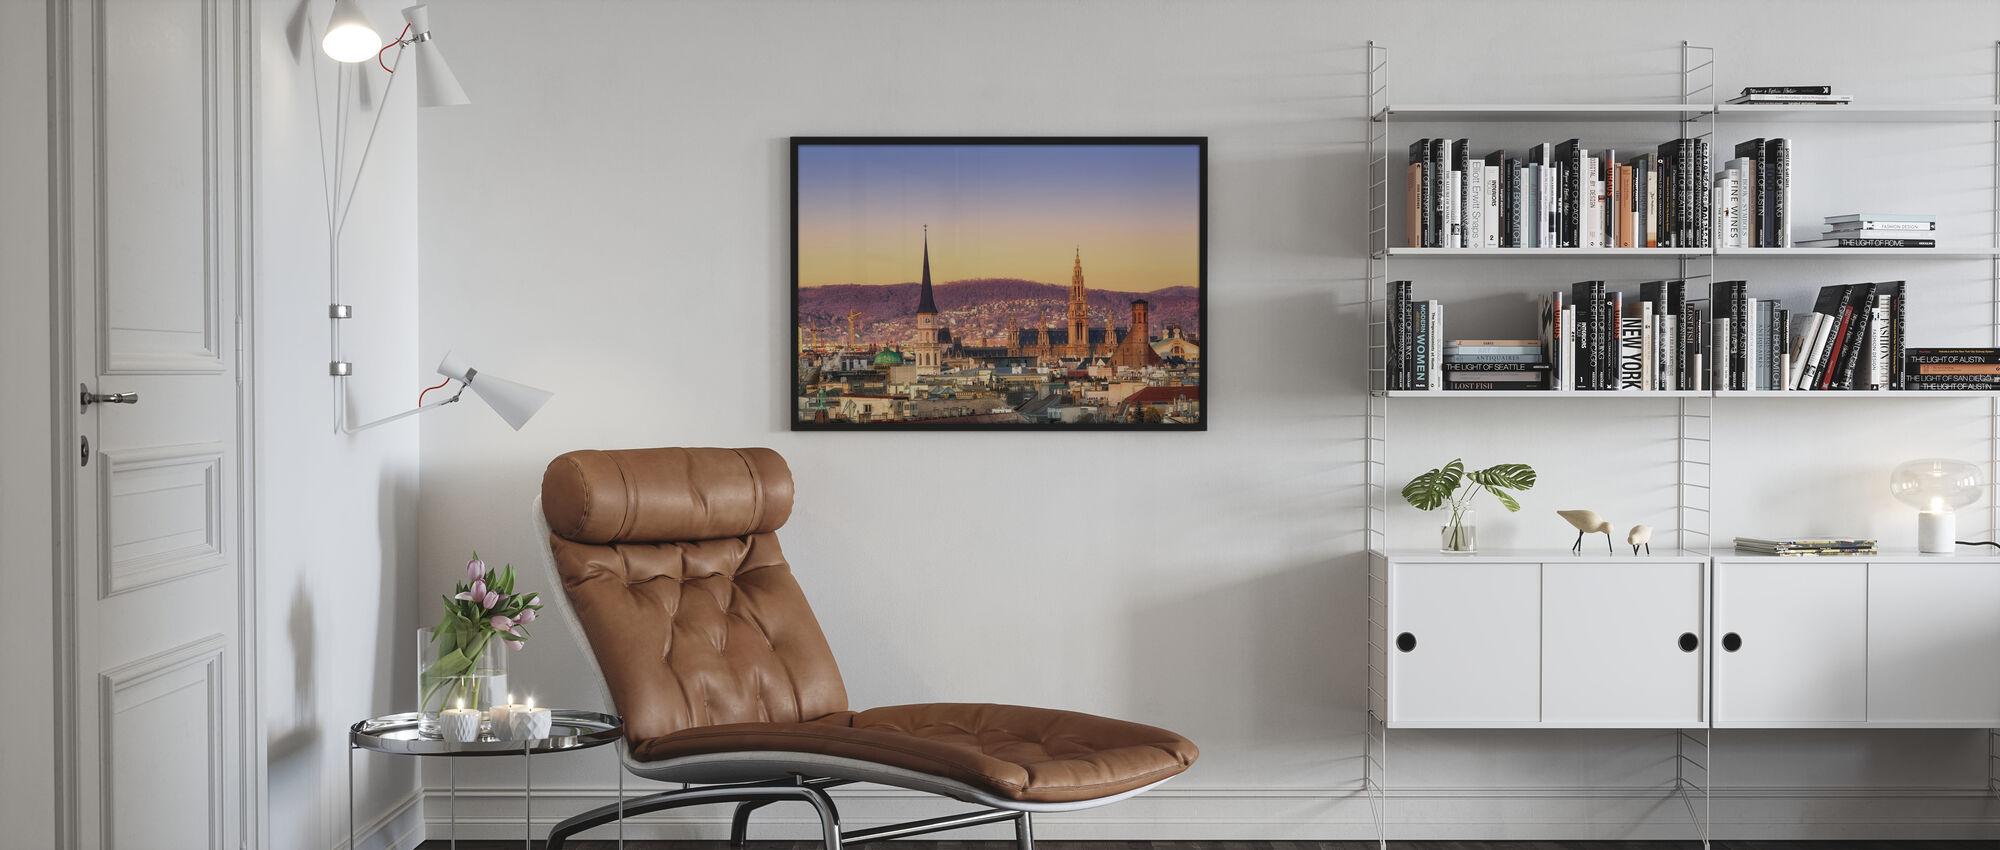 Vienna Sunrise - Framed print - Living Room